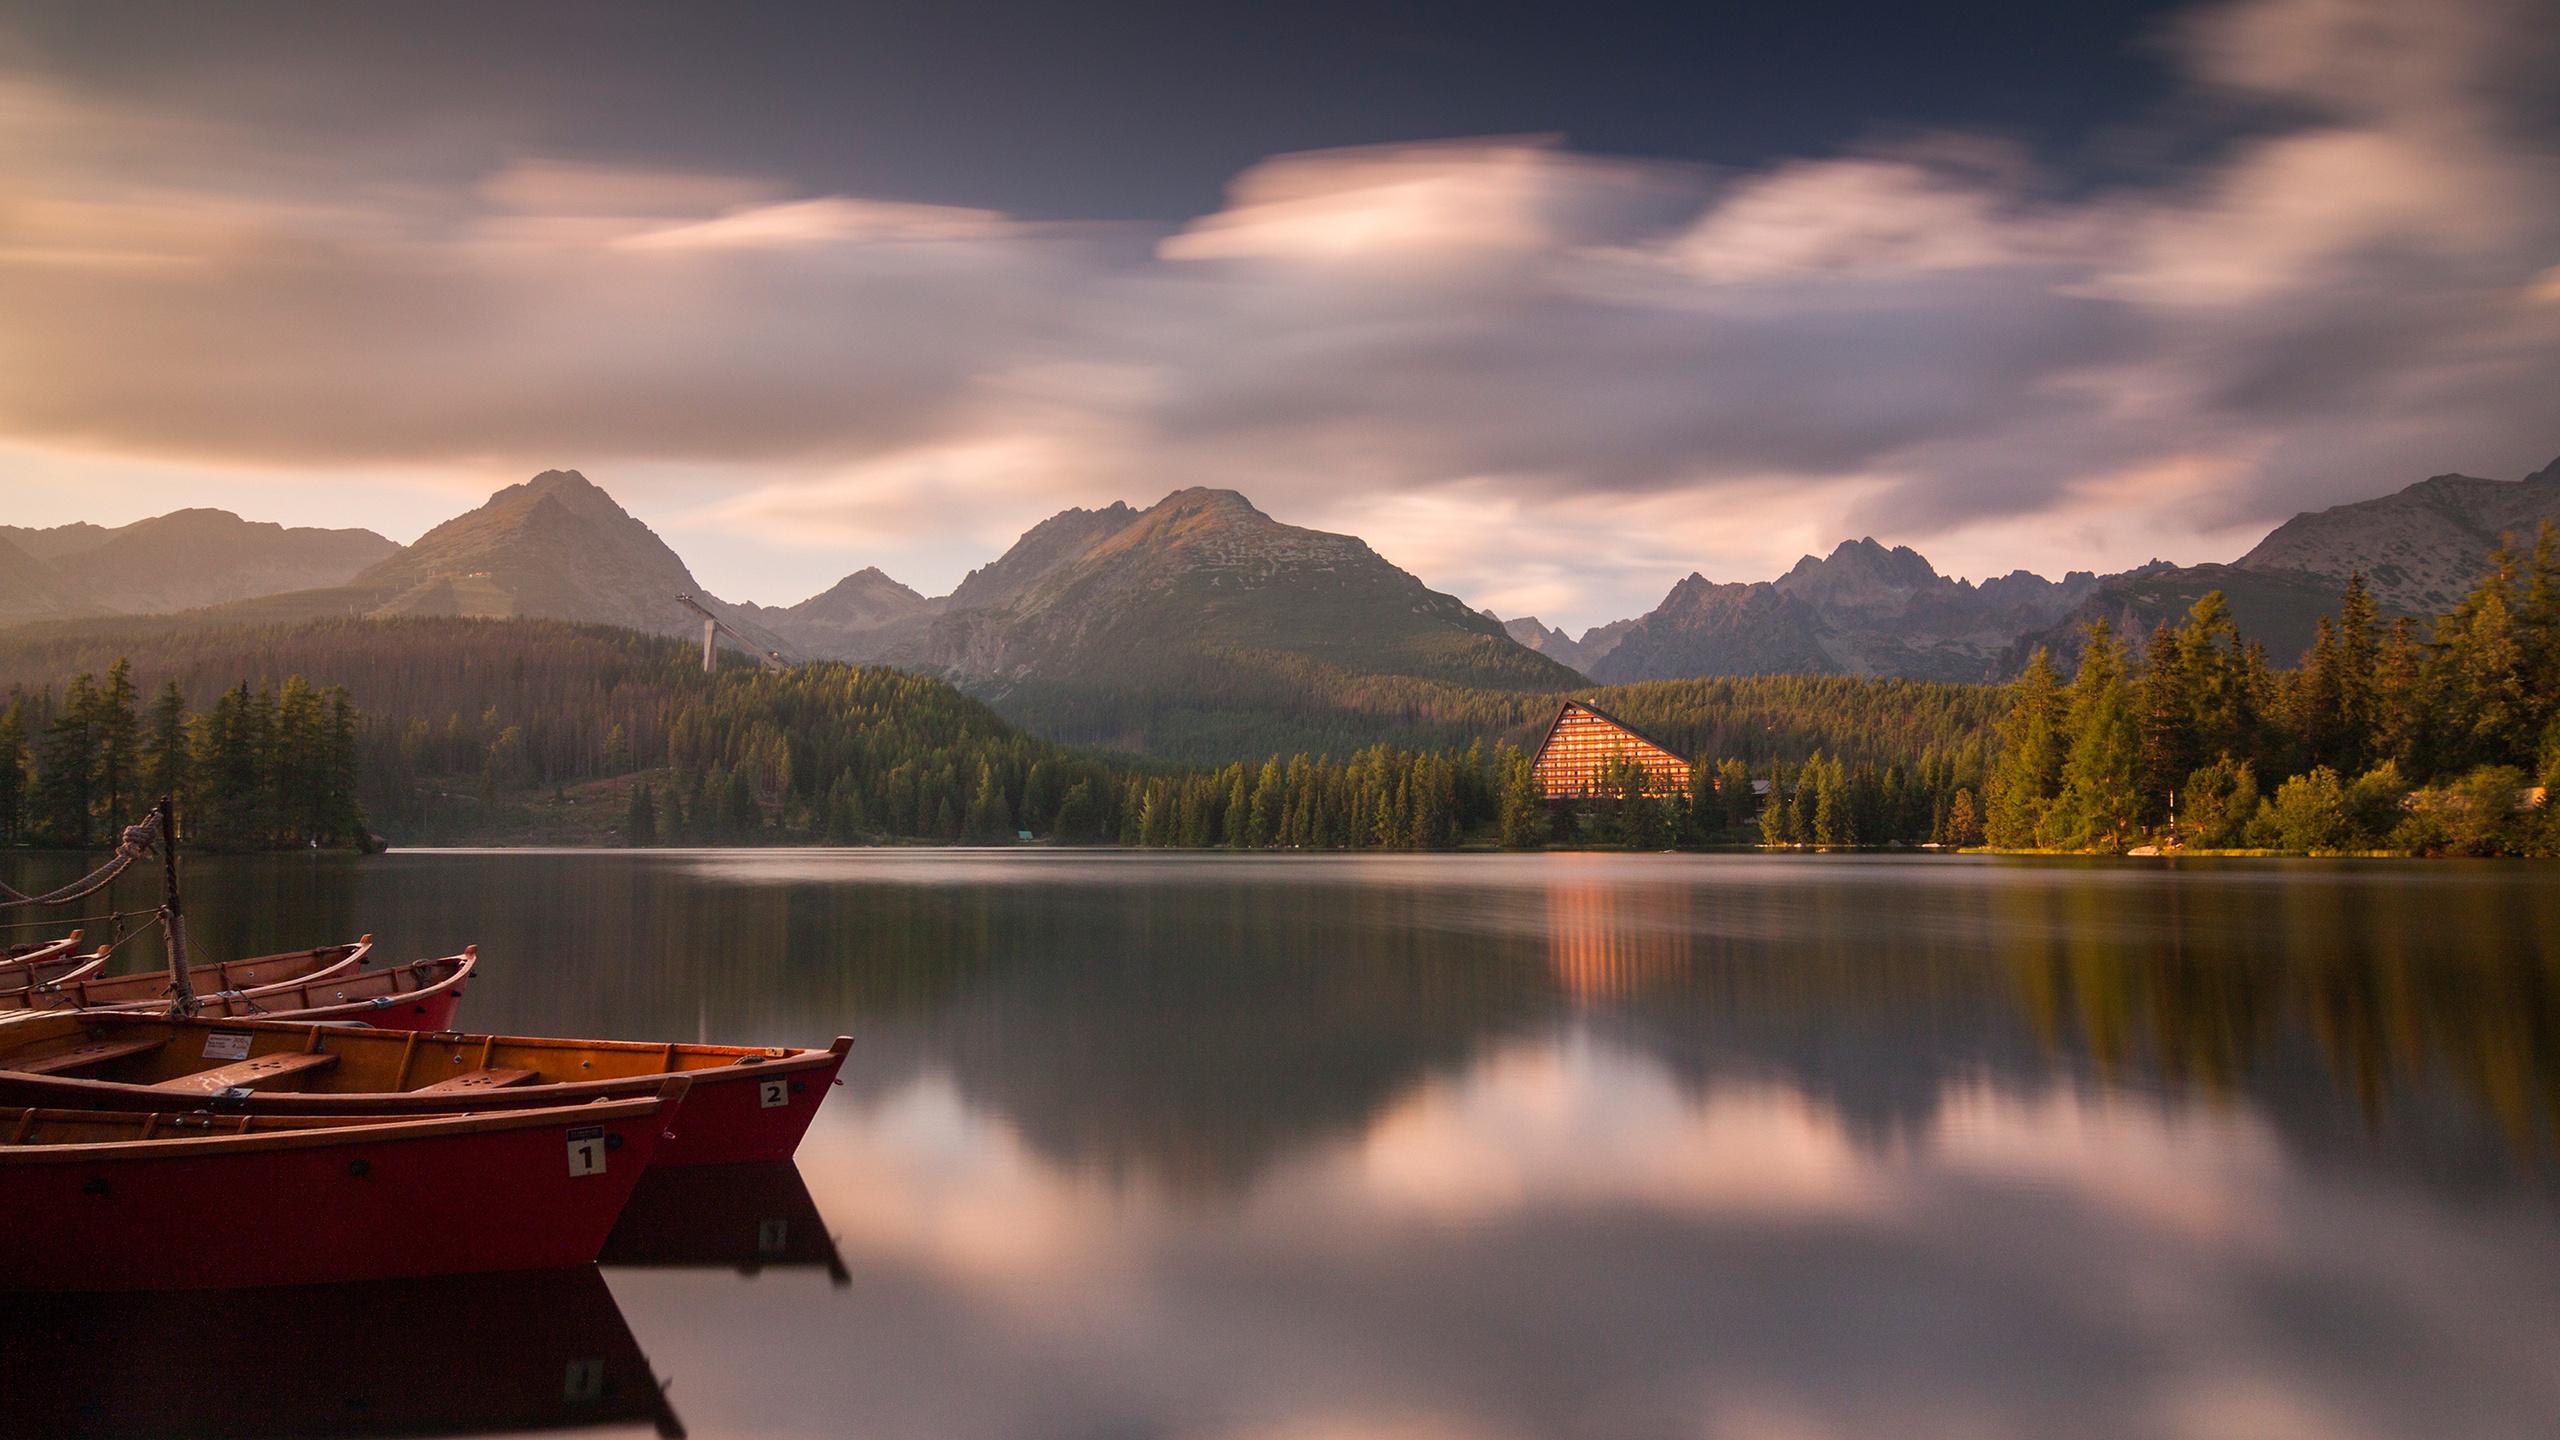 harmony-lake-scenery-wallpaper-1